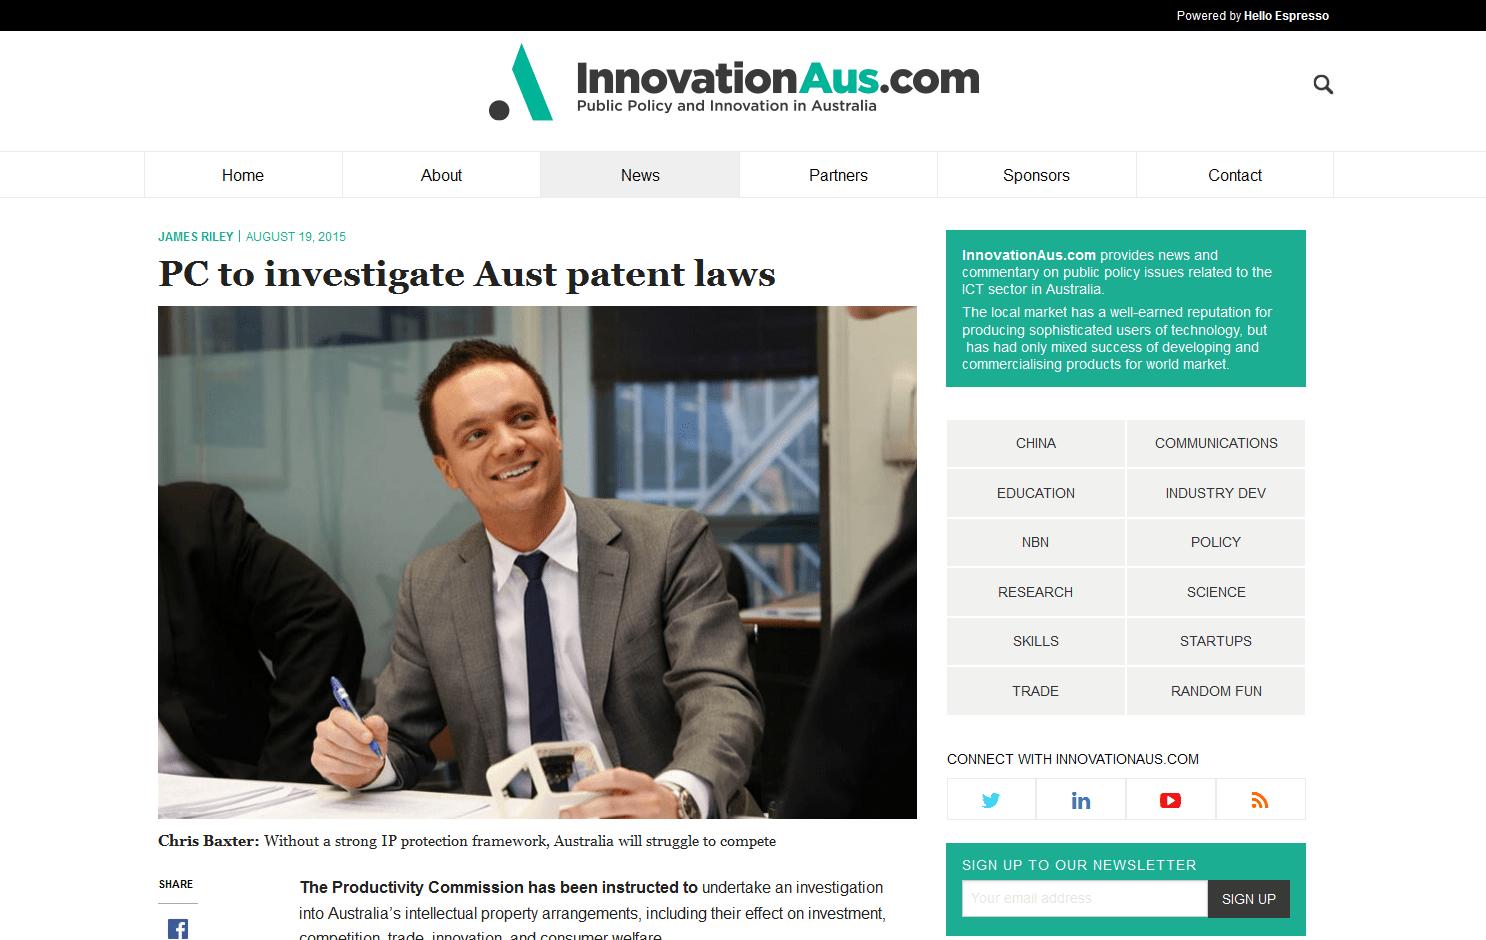 The Productivity Commission to investigate Australia's intellectual property arrangements